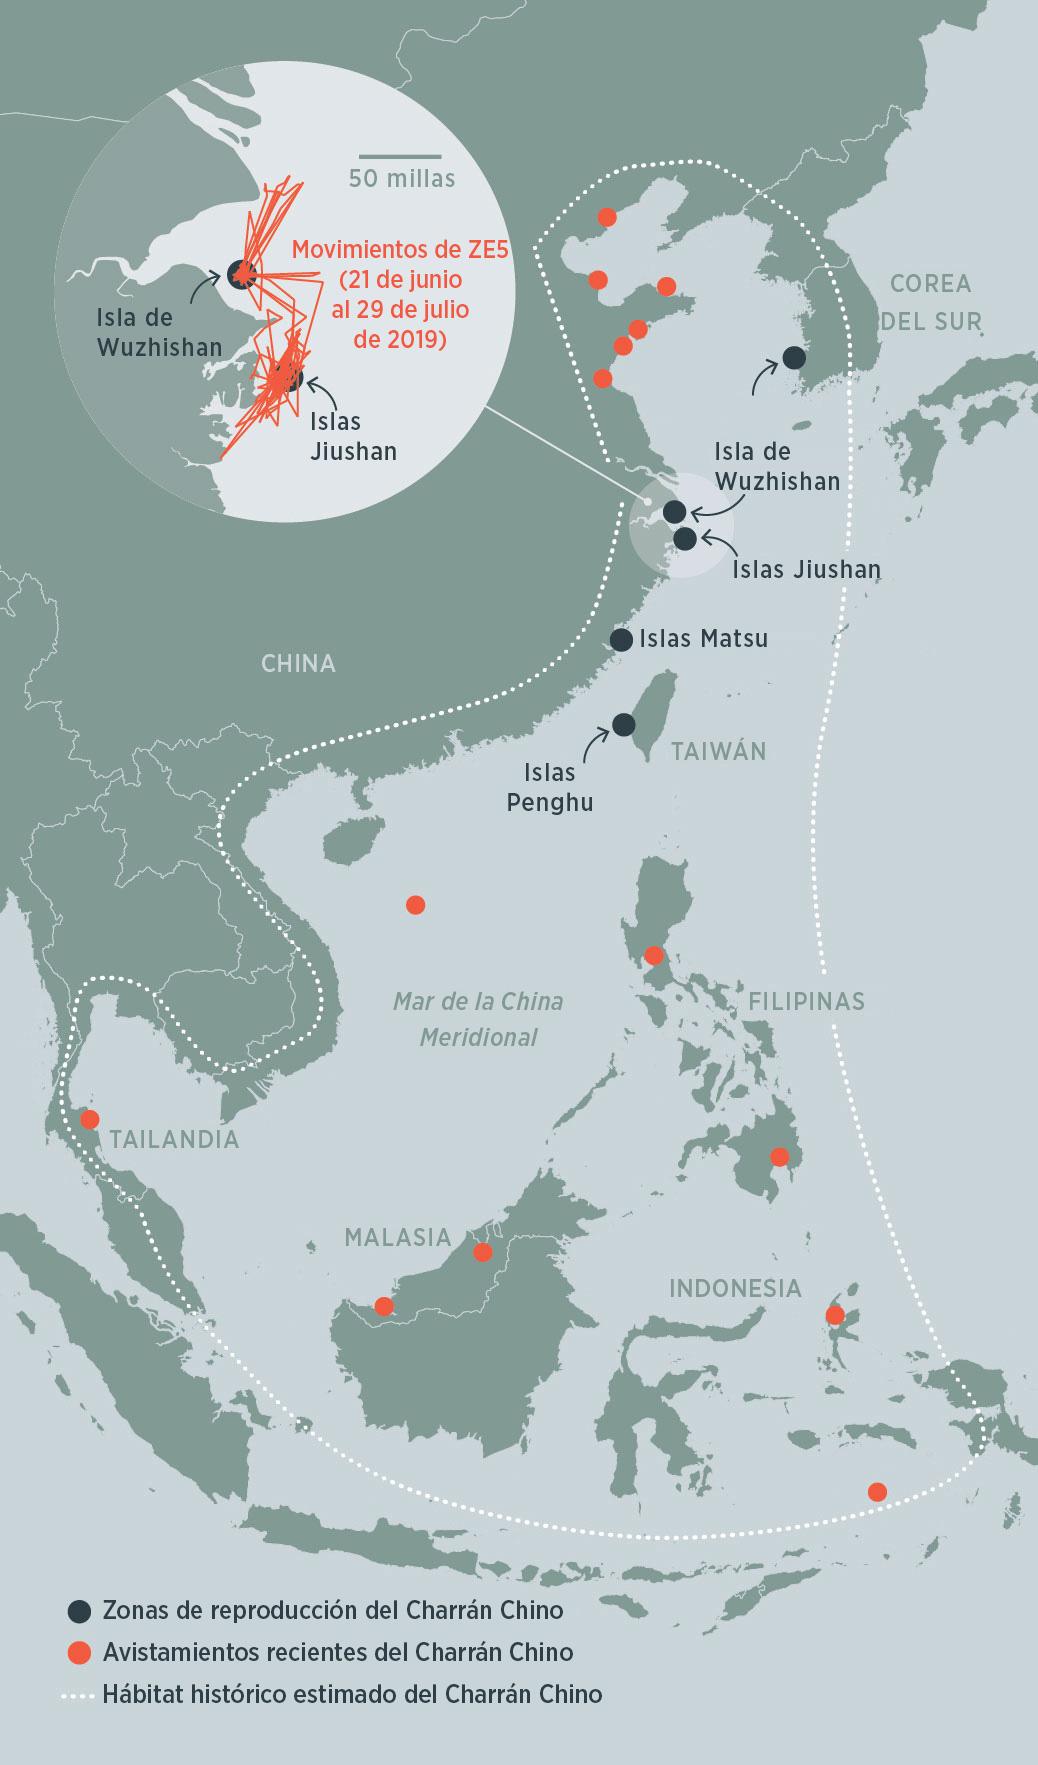 Mapa: Lucy Reading-Ikkanda